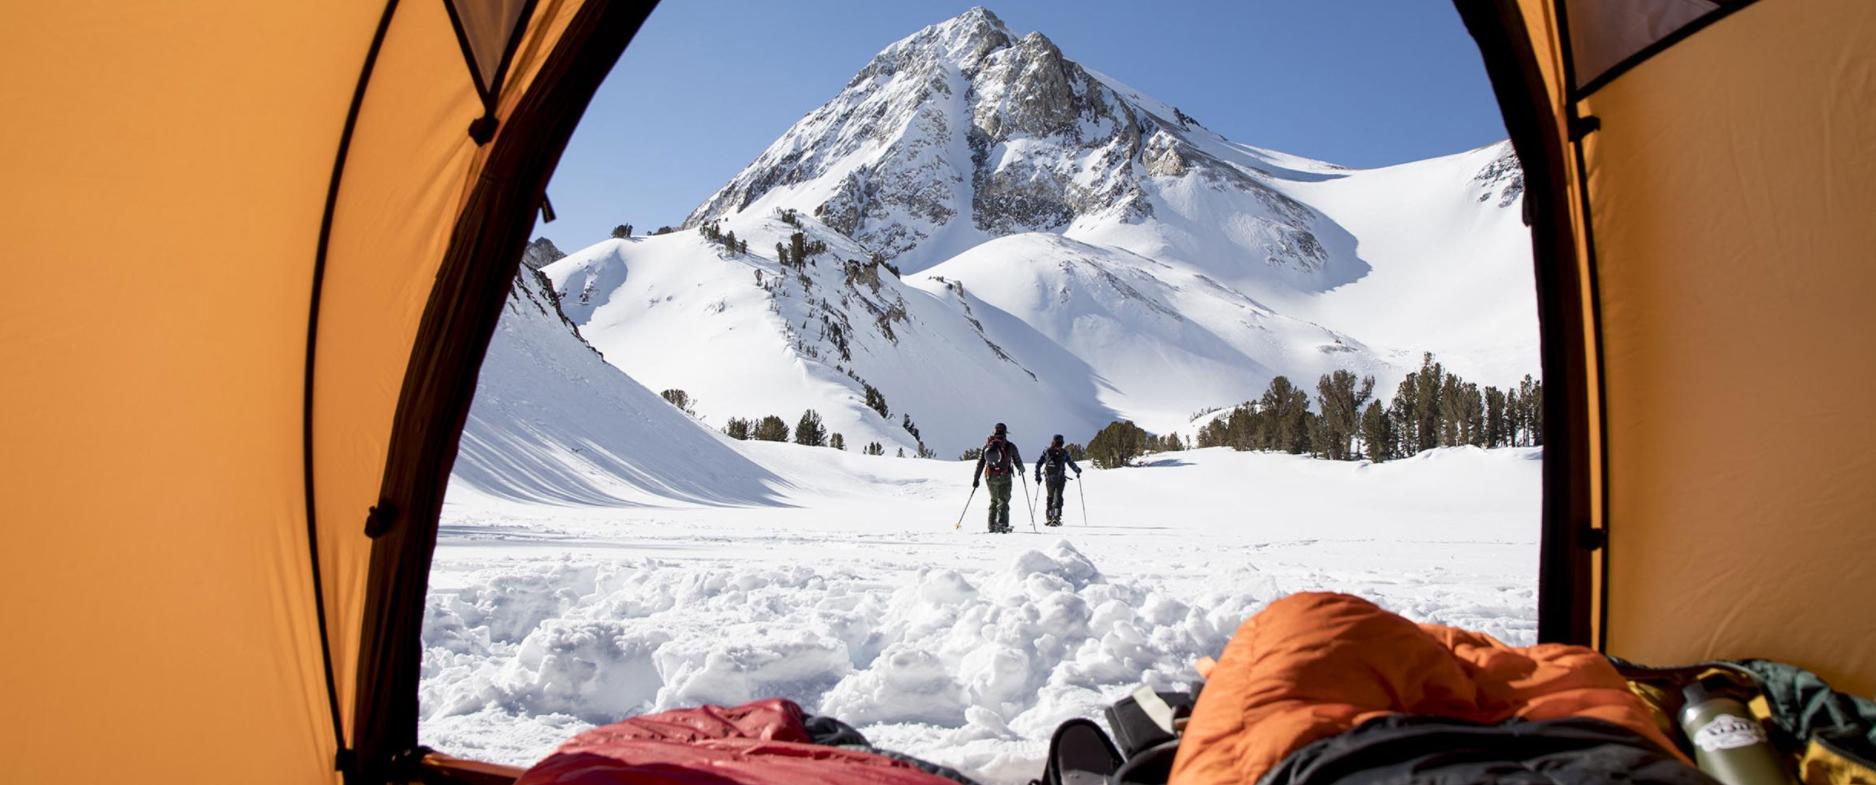 Jones Snowboads | Boardparadise.com